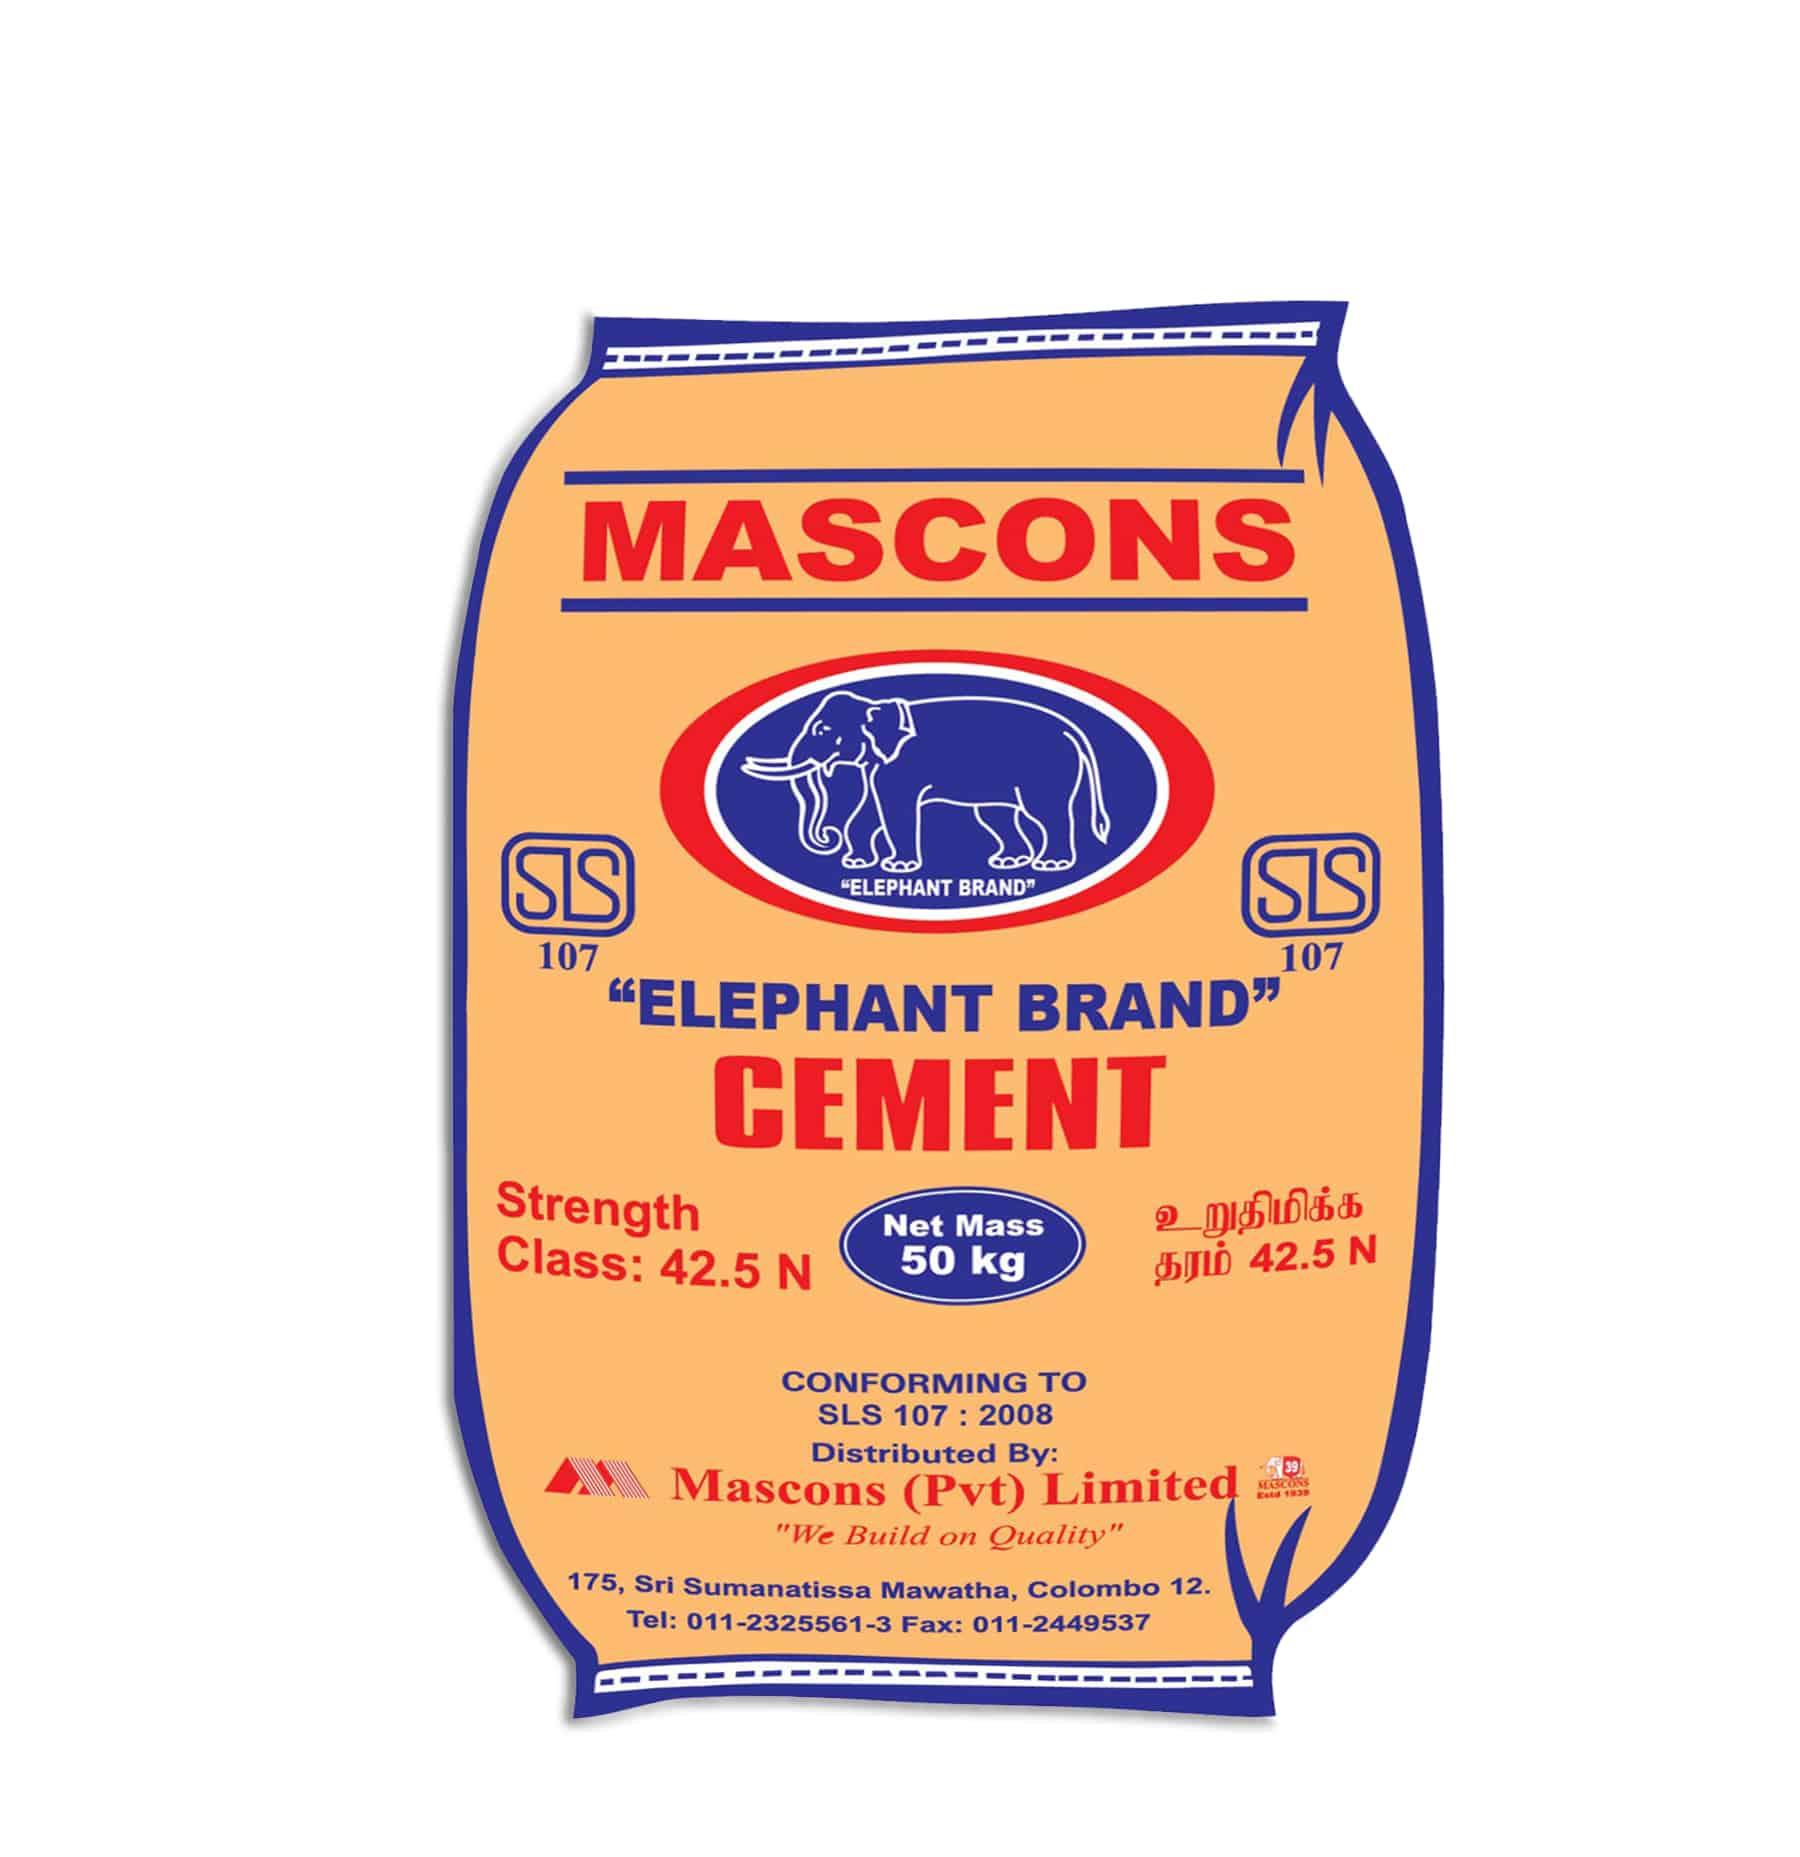 Mascons Elephant Brand Cement in Sri Lanka